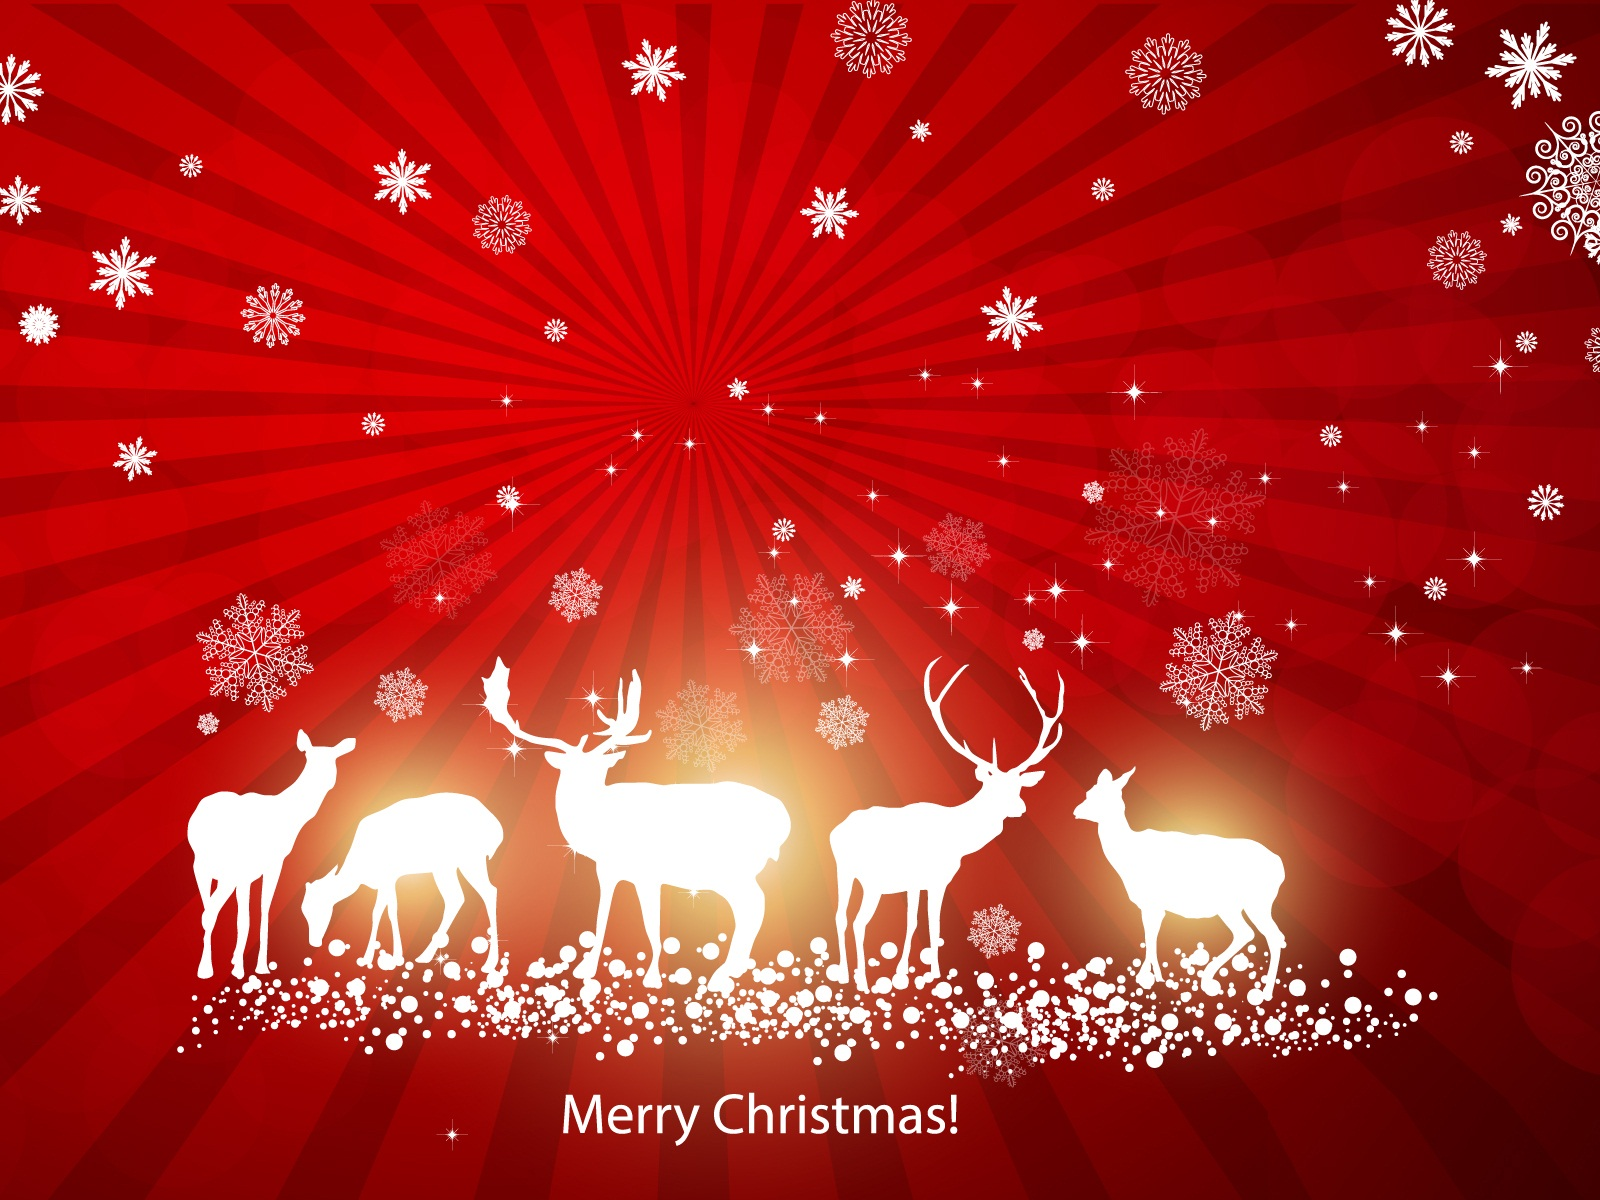 Merry Christmas Wallpapers Free - WallpaperSafari